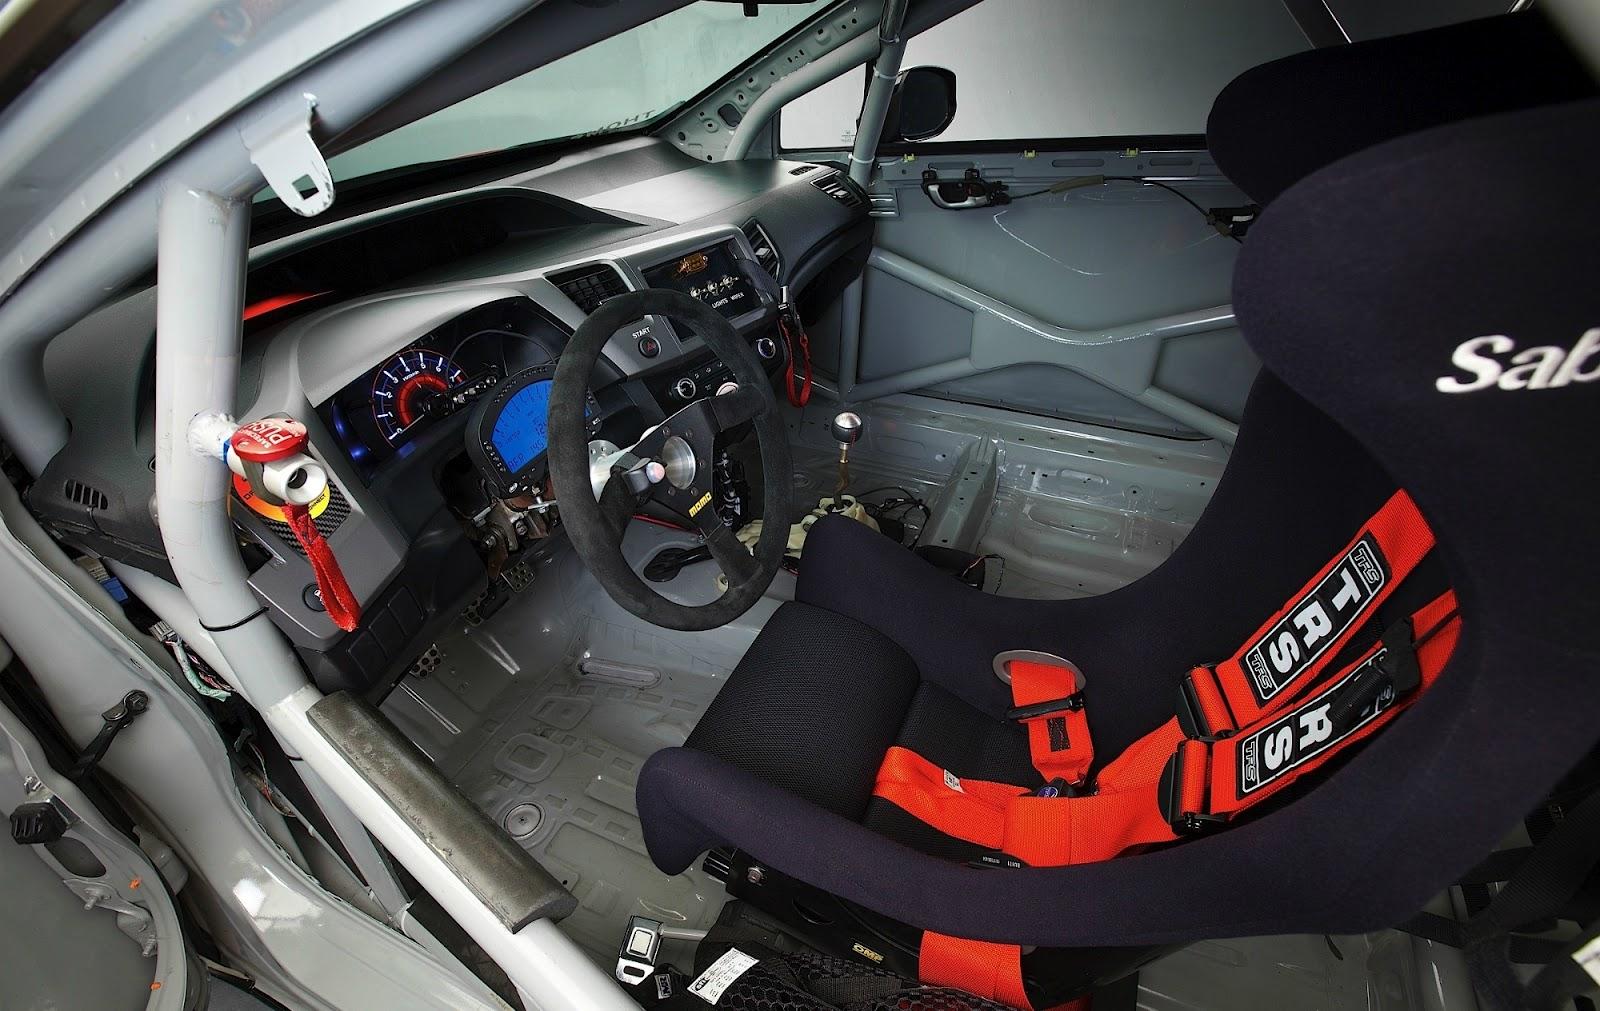 Honda Civic Si Coupe Compass 360 Racing Hpd Sema 2012 Car Design And Mechanical Engineering